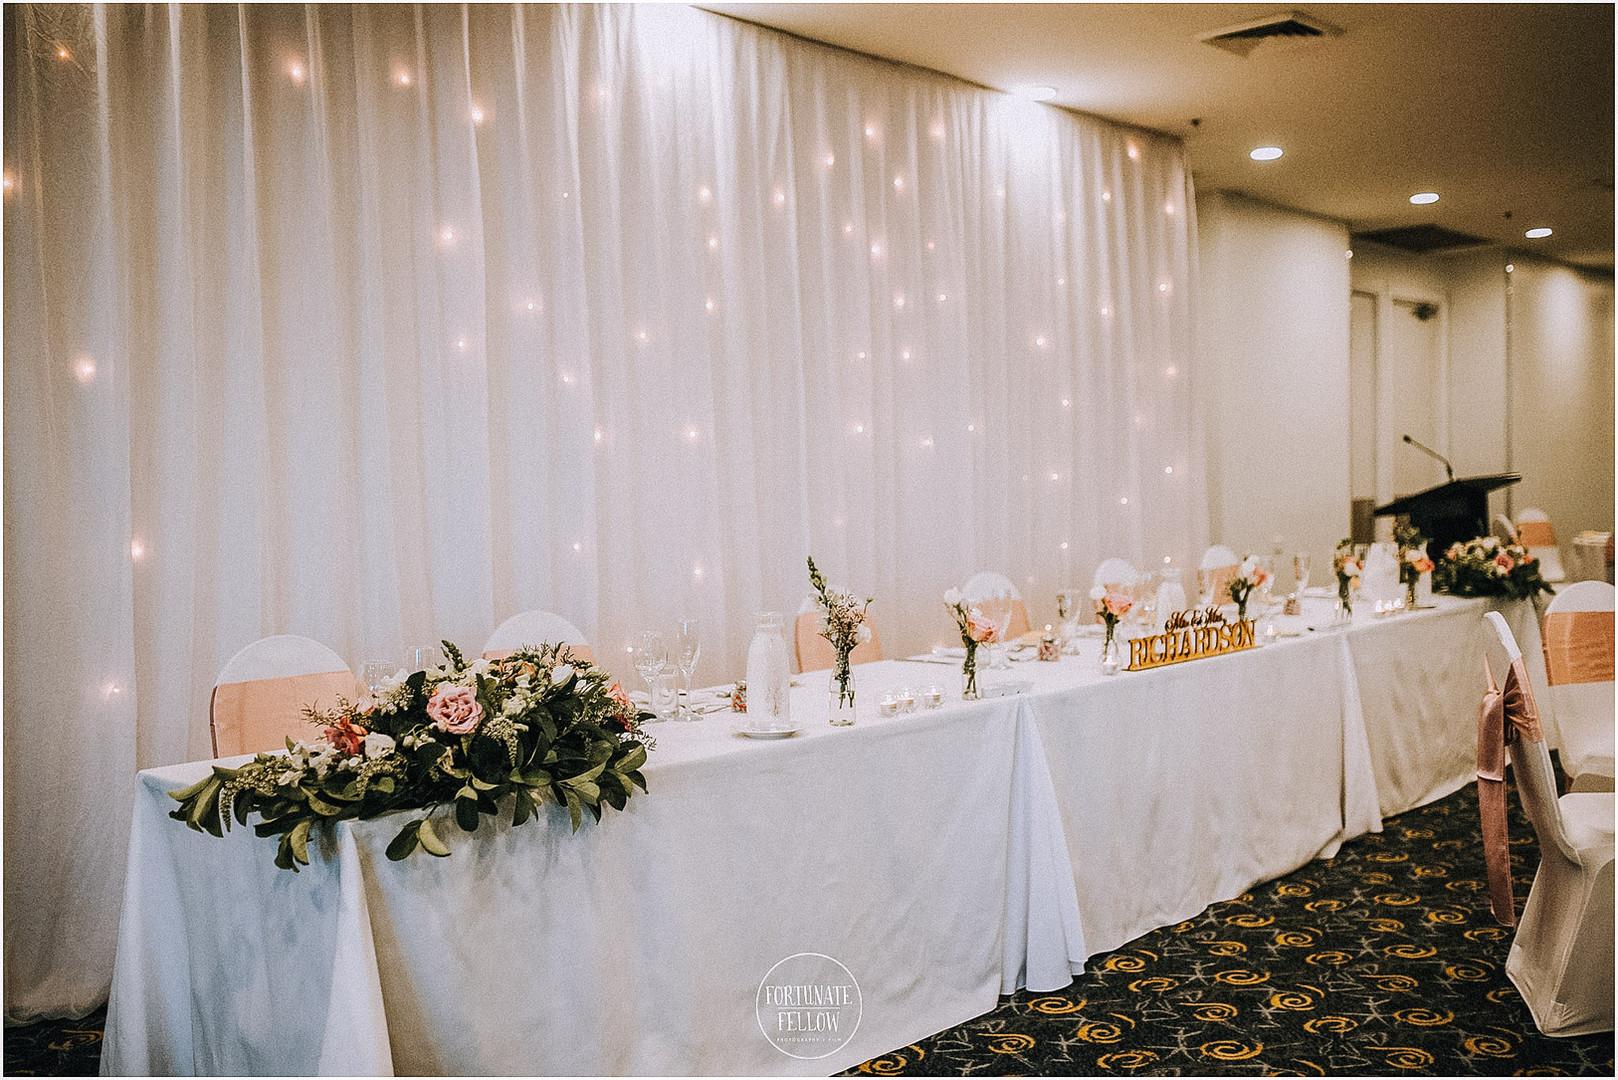 WeddingWebsite_Compressed-89.jpg